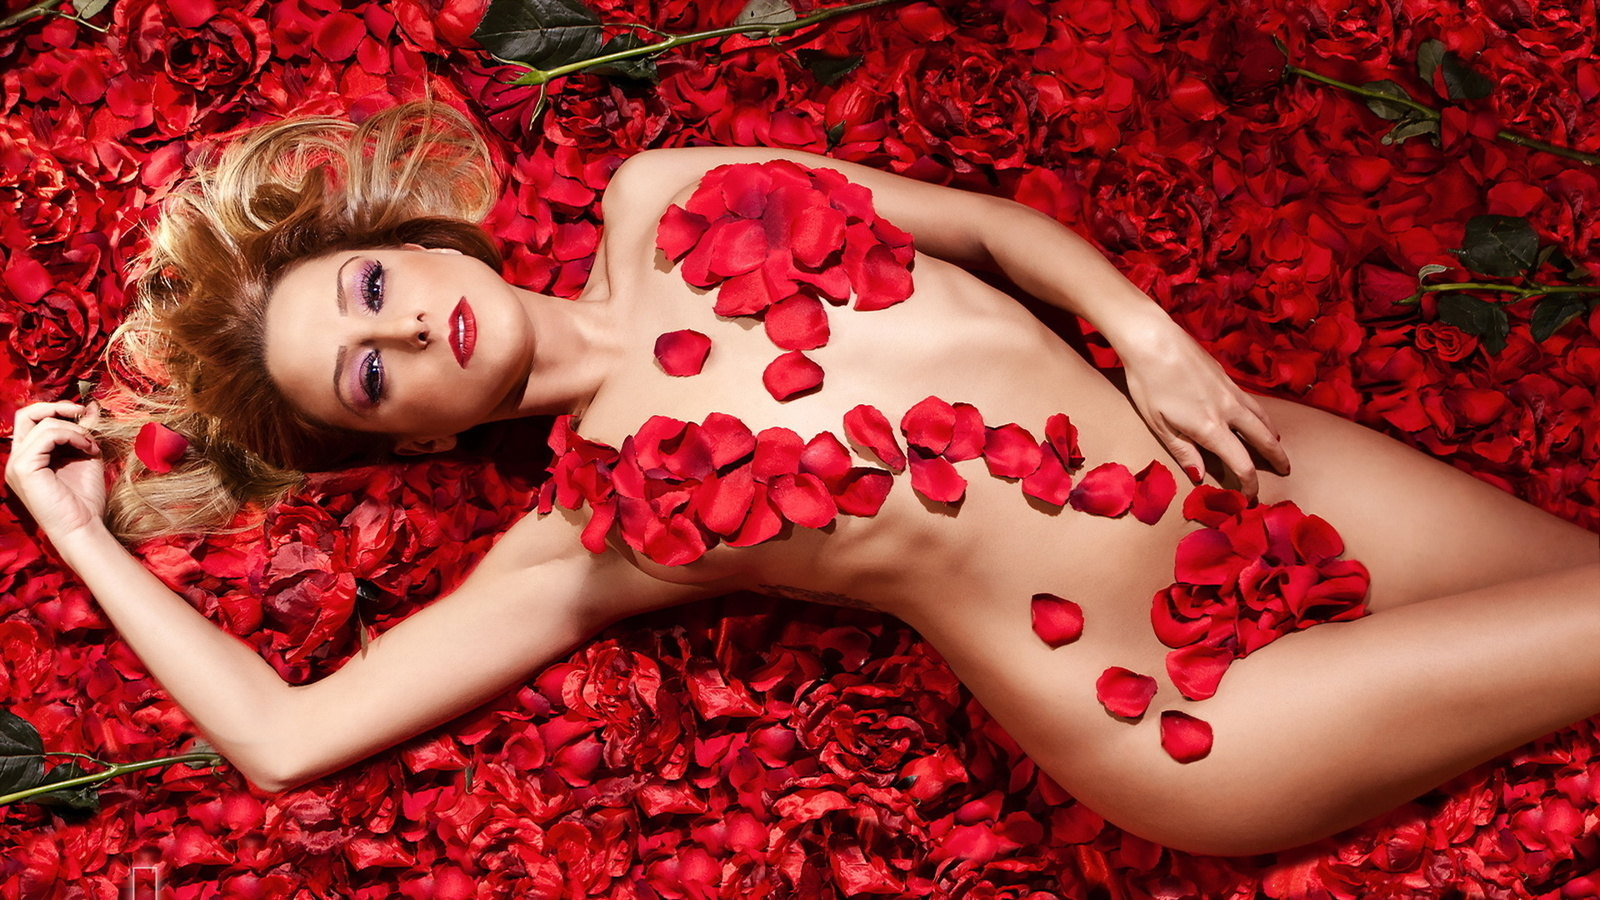 Девушки розы фото ню, качество порно видео онлайн